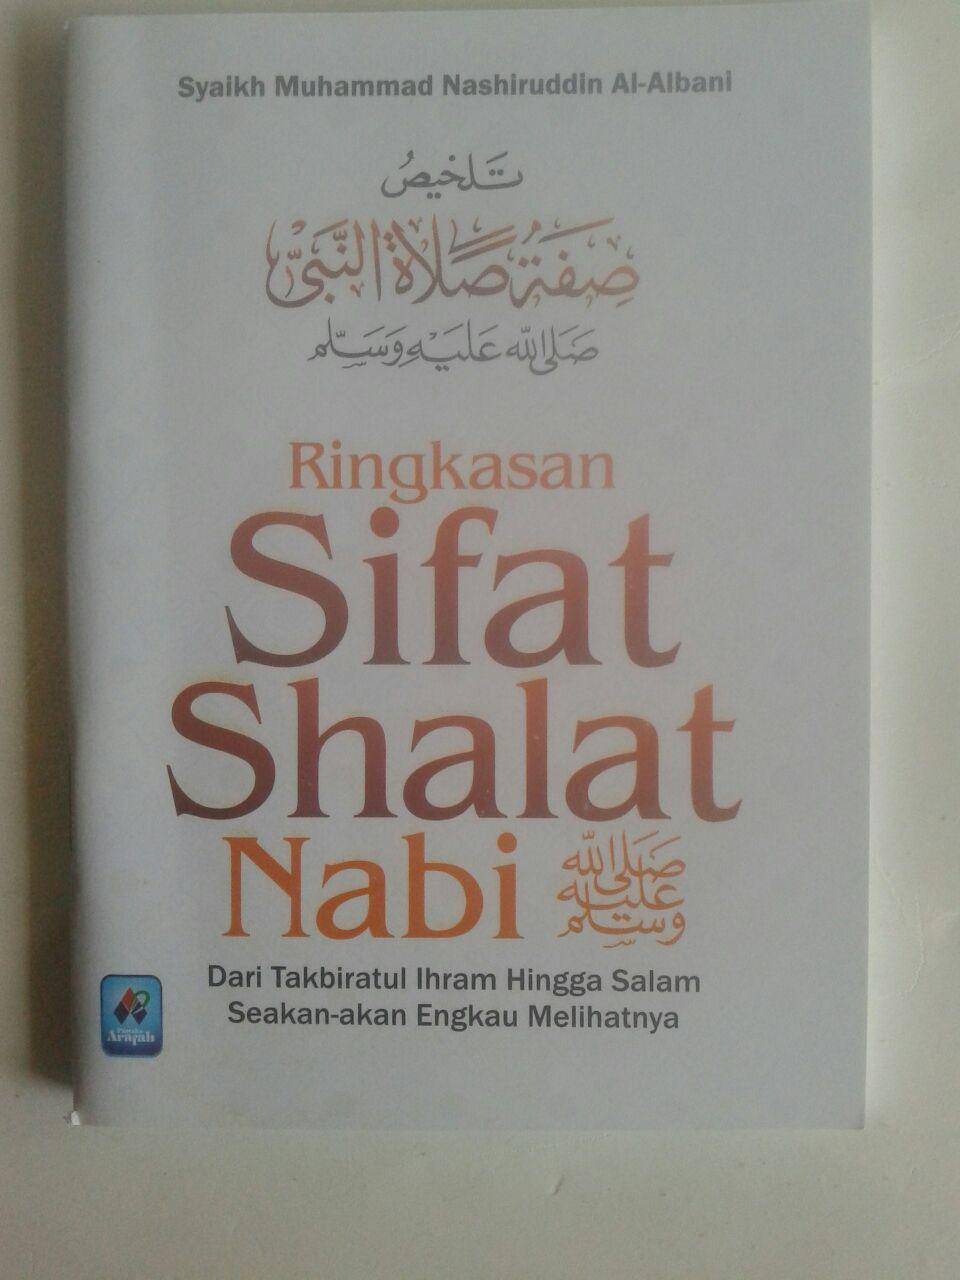 Buku Saku Ringkasan Sifat Shalat Nabi Dari Takbir Hingga Salam cover 2